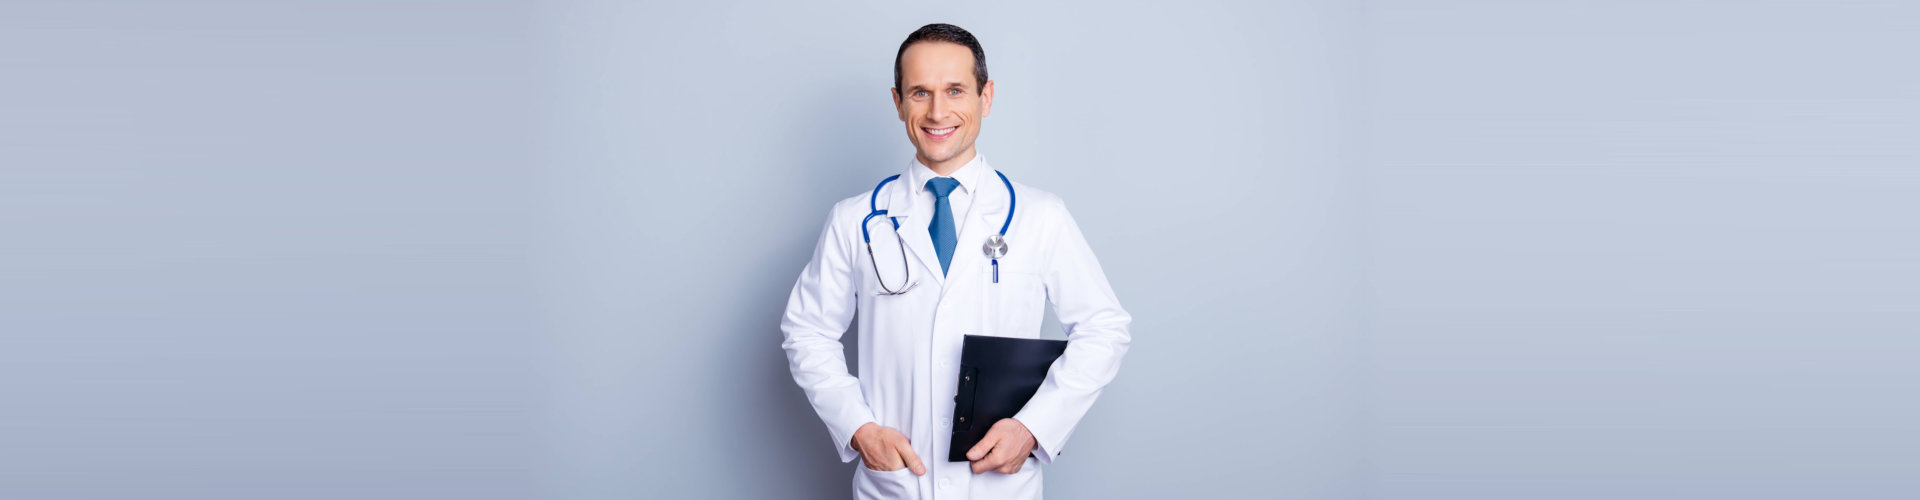 smiling male pharmacist